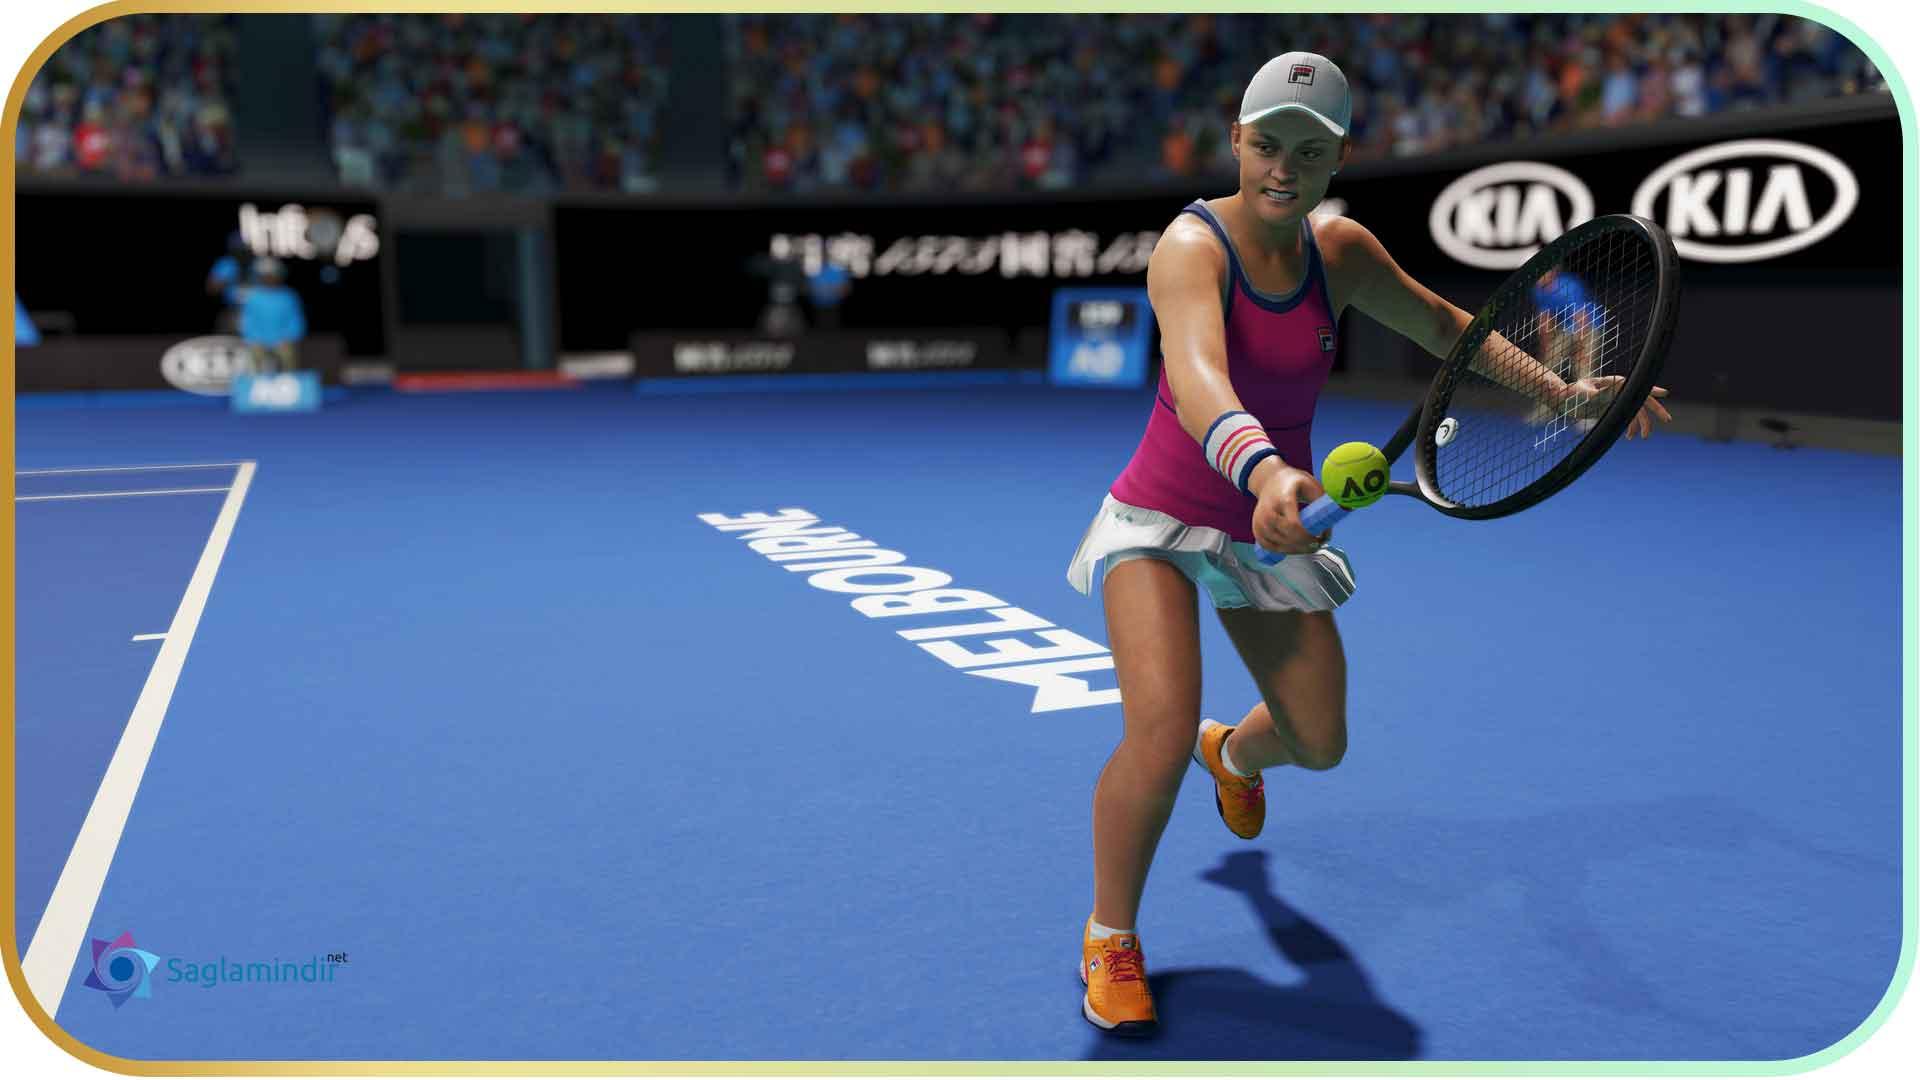 AO Tennis 2 full indir